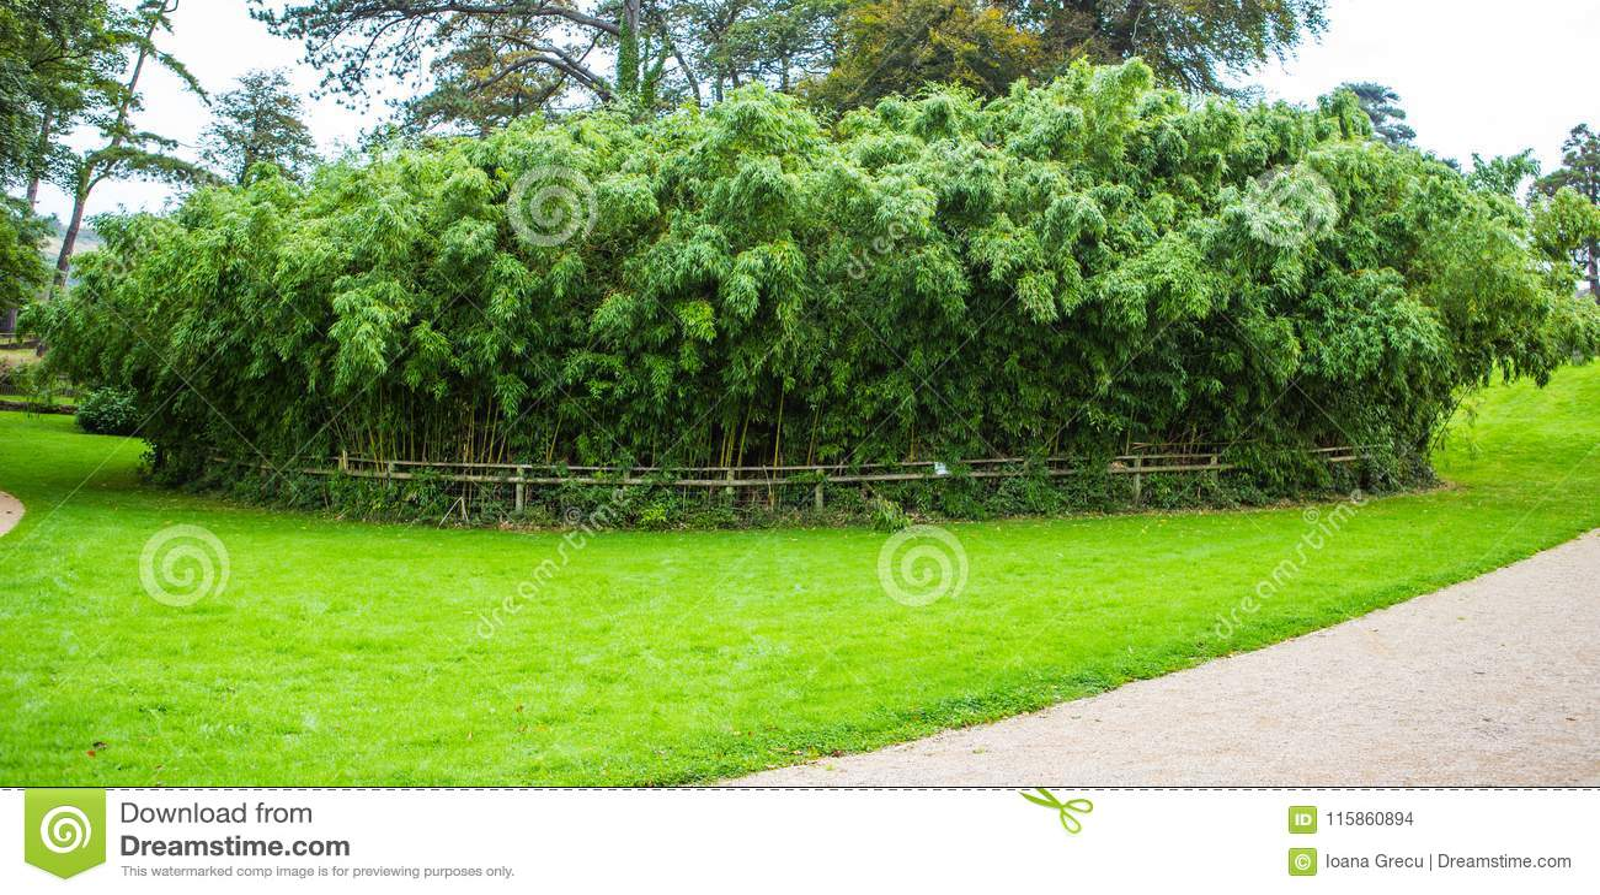 Margam城堡的竹森林从事园艺,鲸鱼